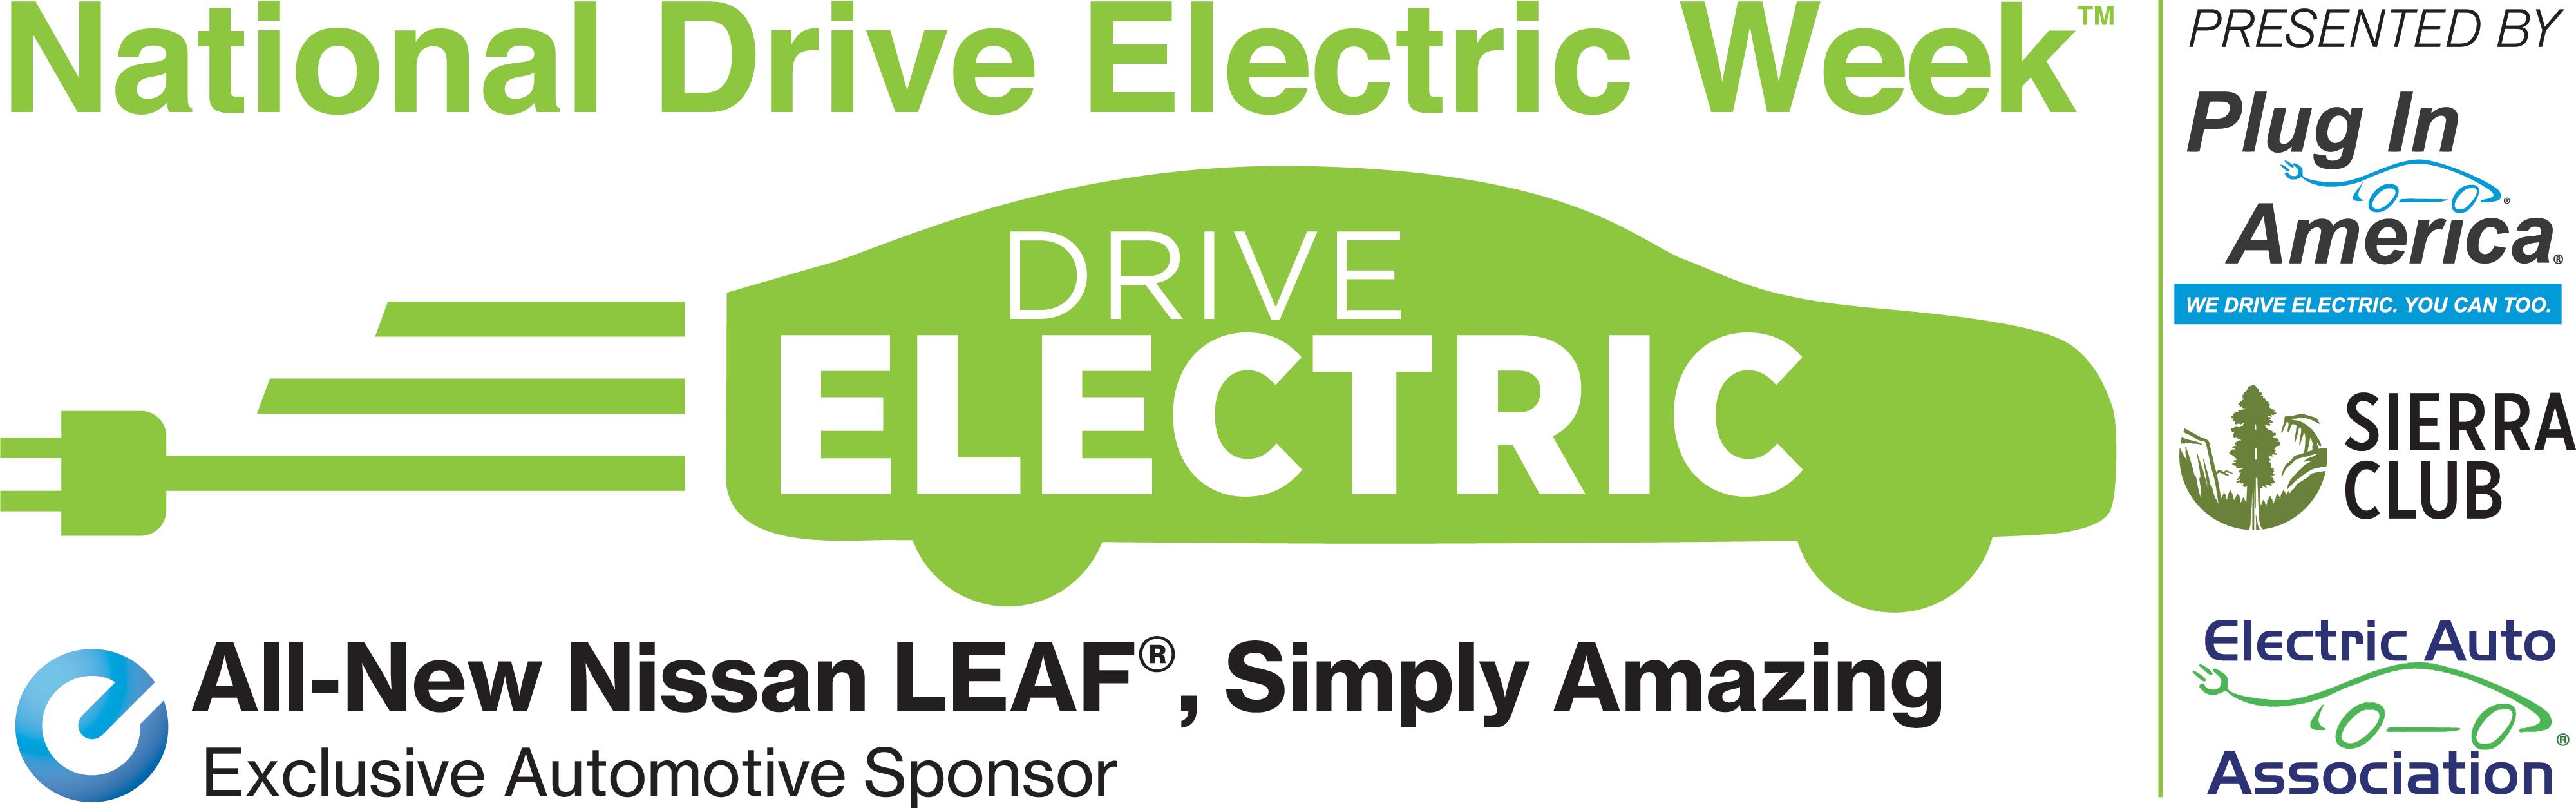 National Drive Electric Week logo